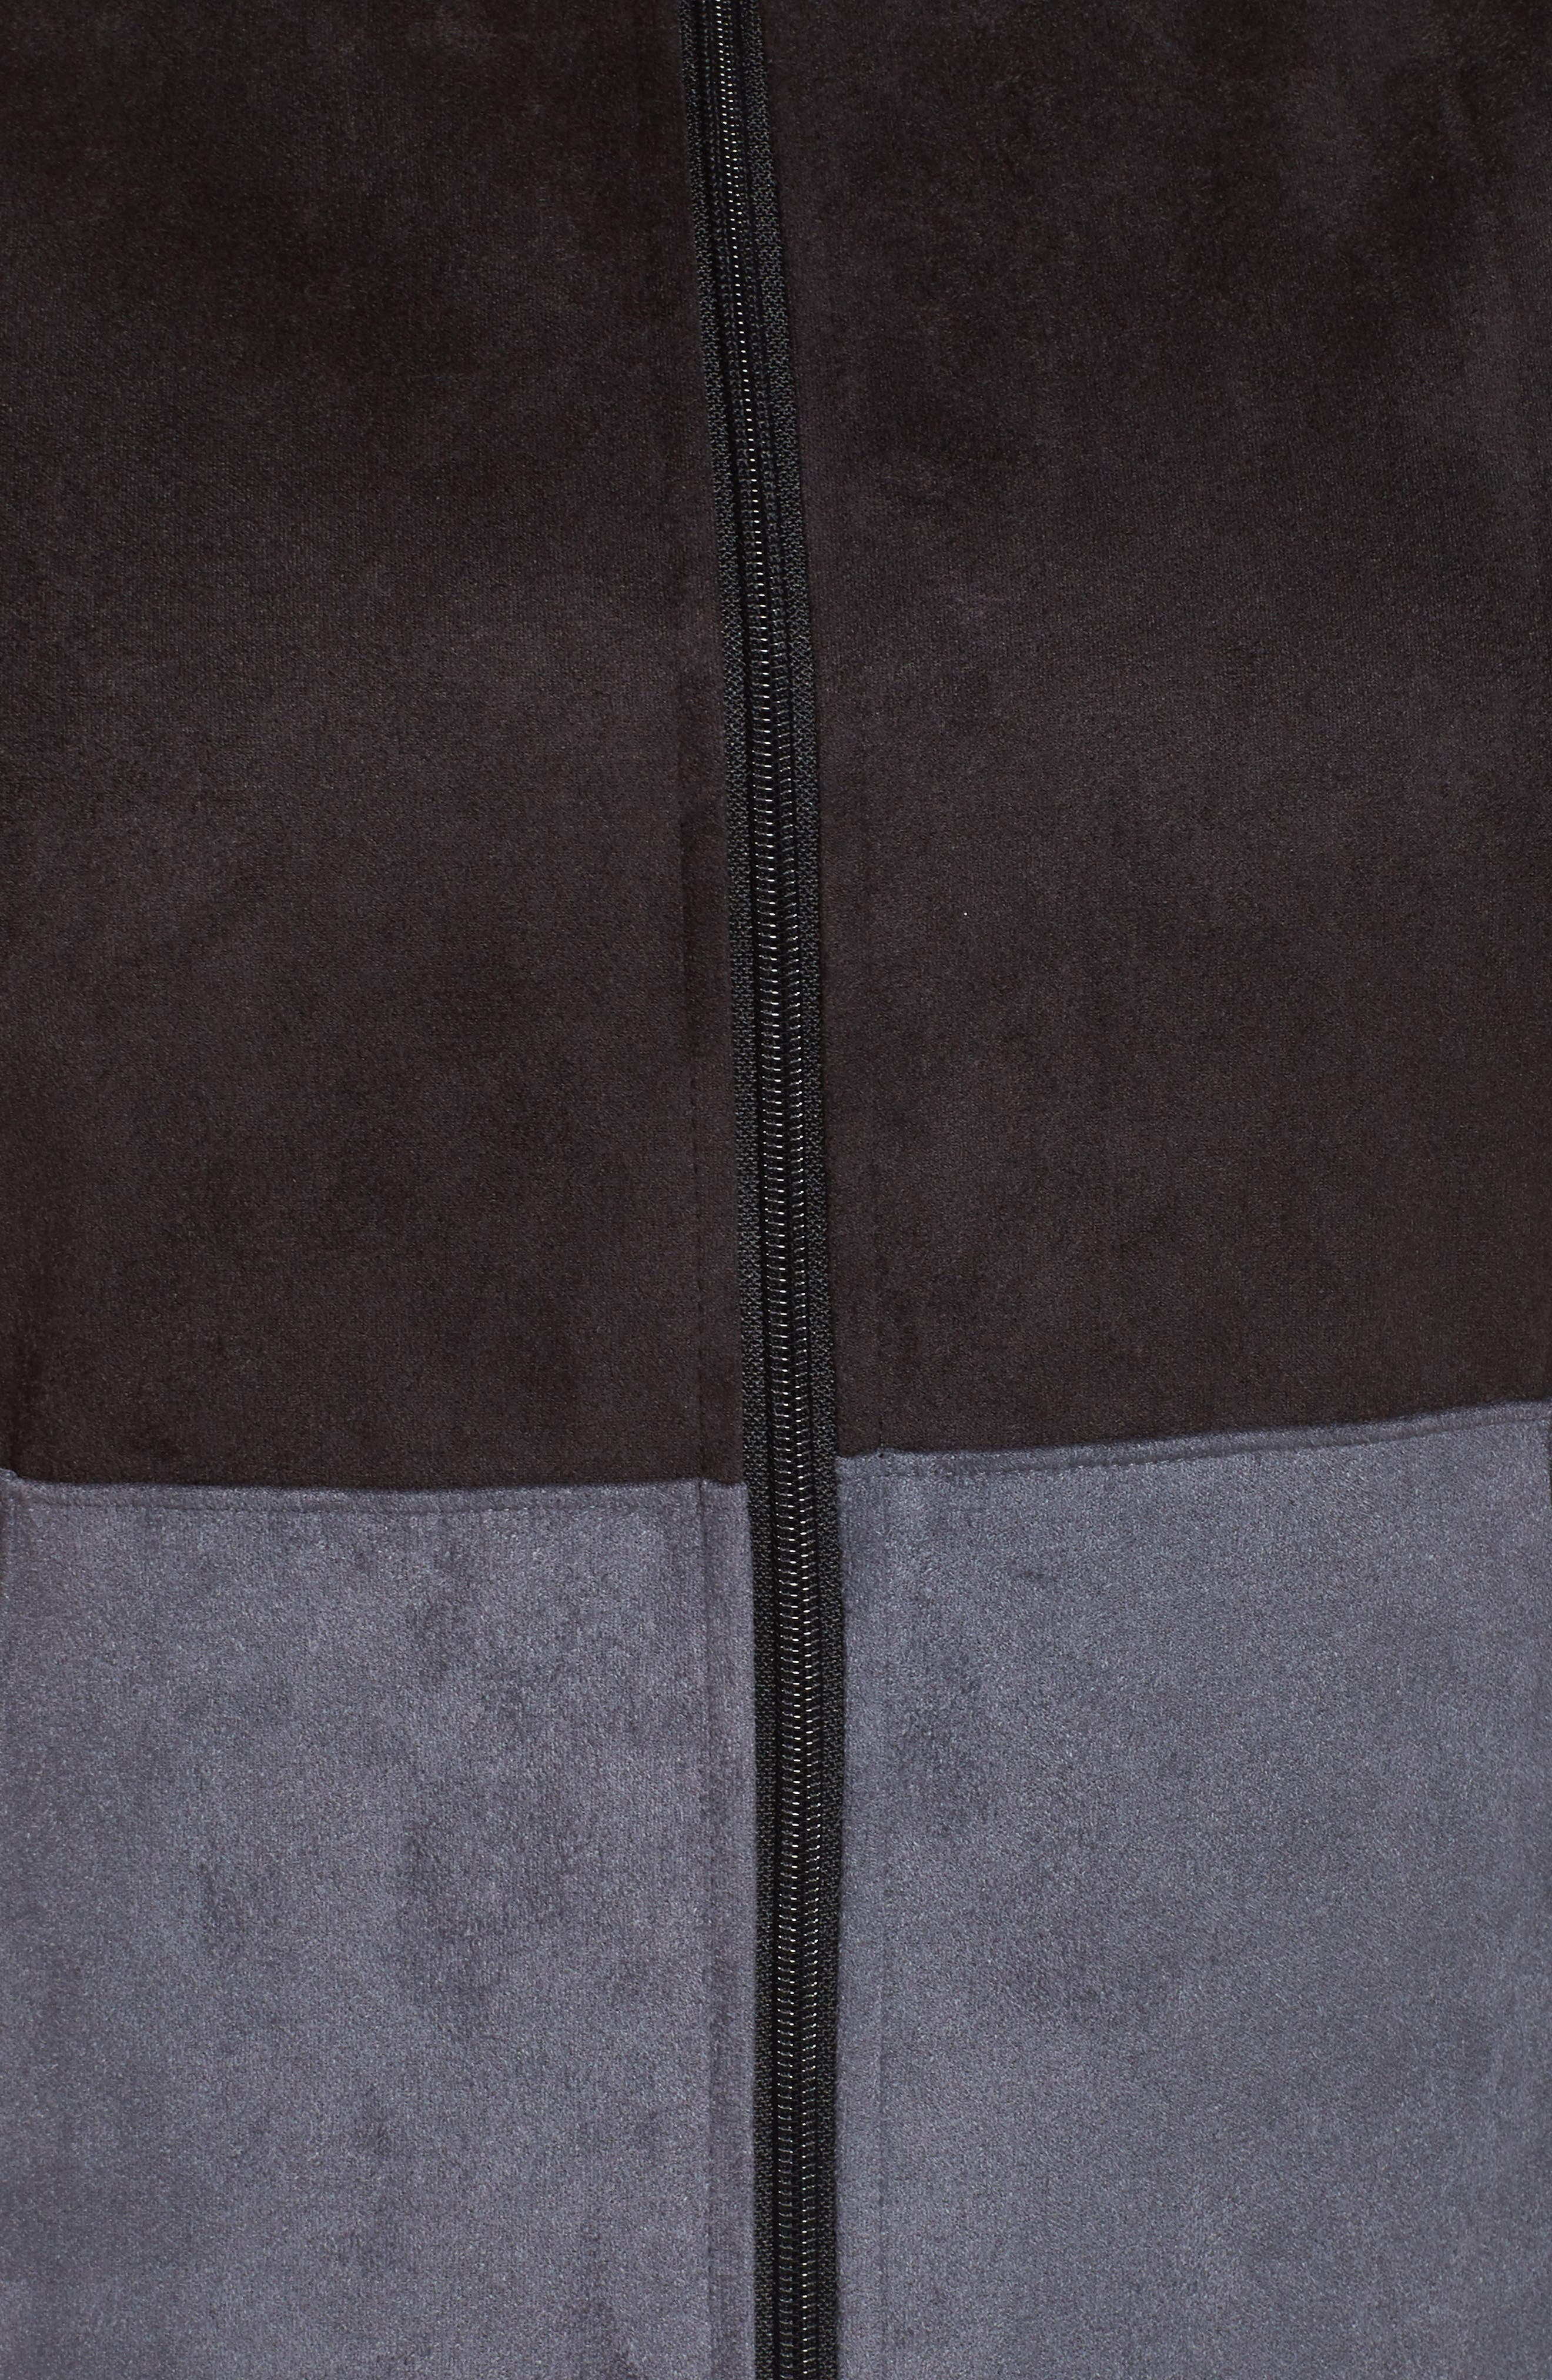 Track Jacket,                             Alternate thumbnail 6, color,                             001